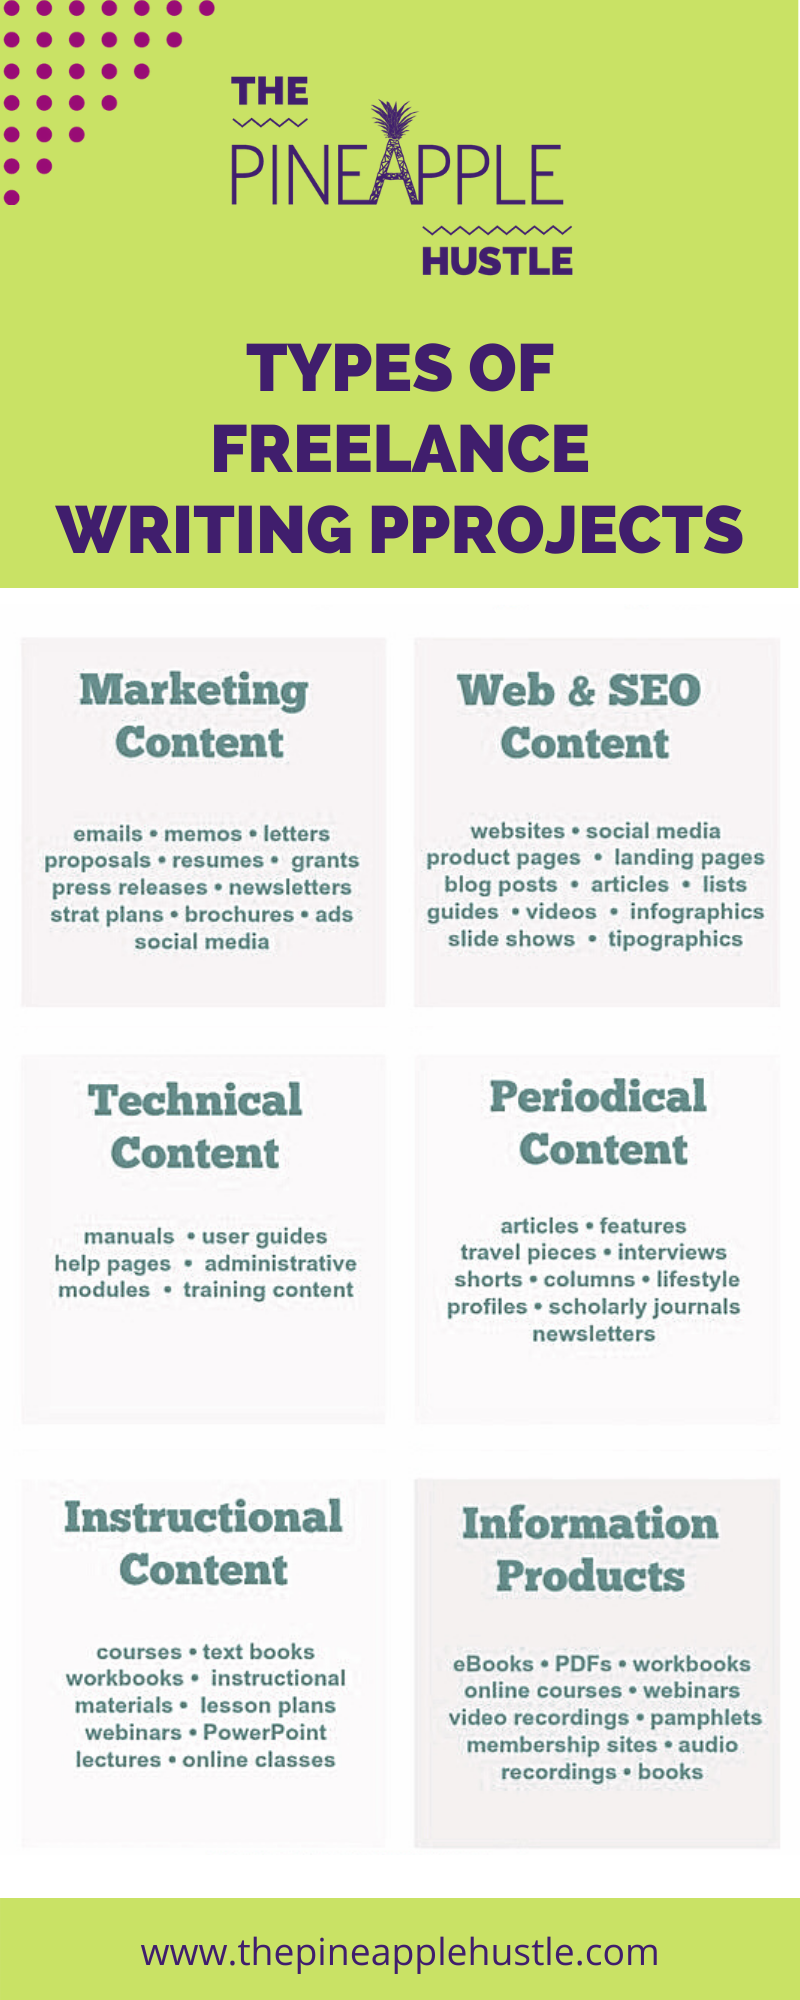 Types Of Freelance Writing Projects Social Media Infographic Freelance Writing Web Marketing